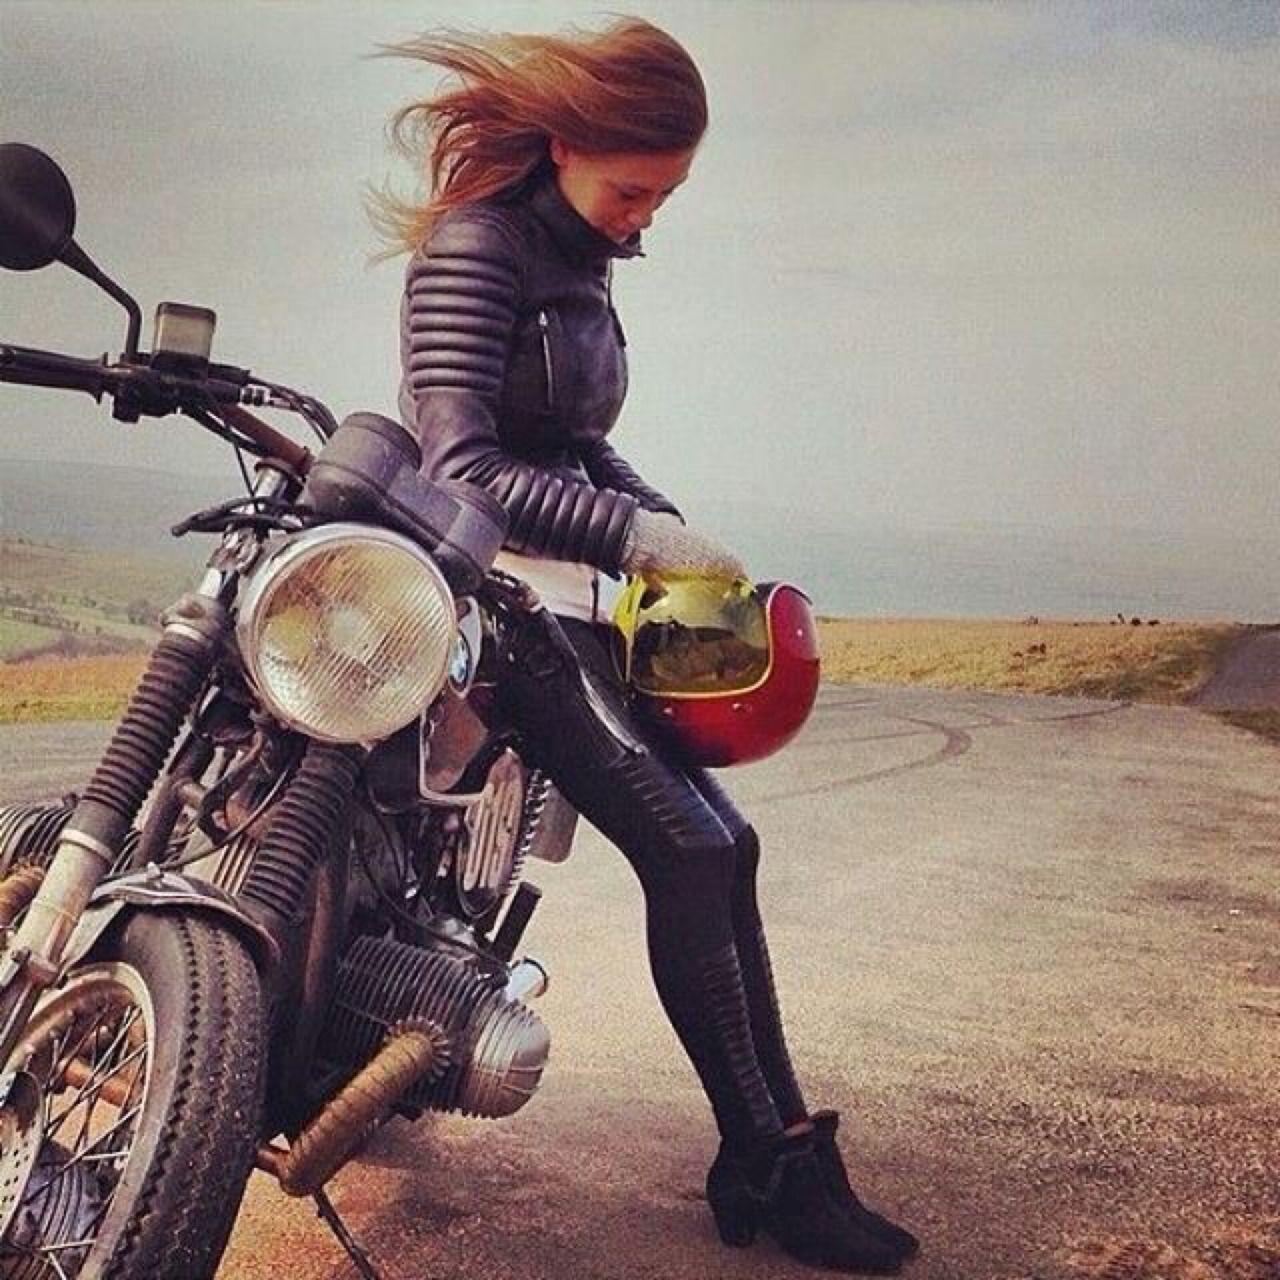 Картинки по запросу девушка на мотоцикле аву | Байкерша